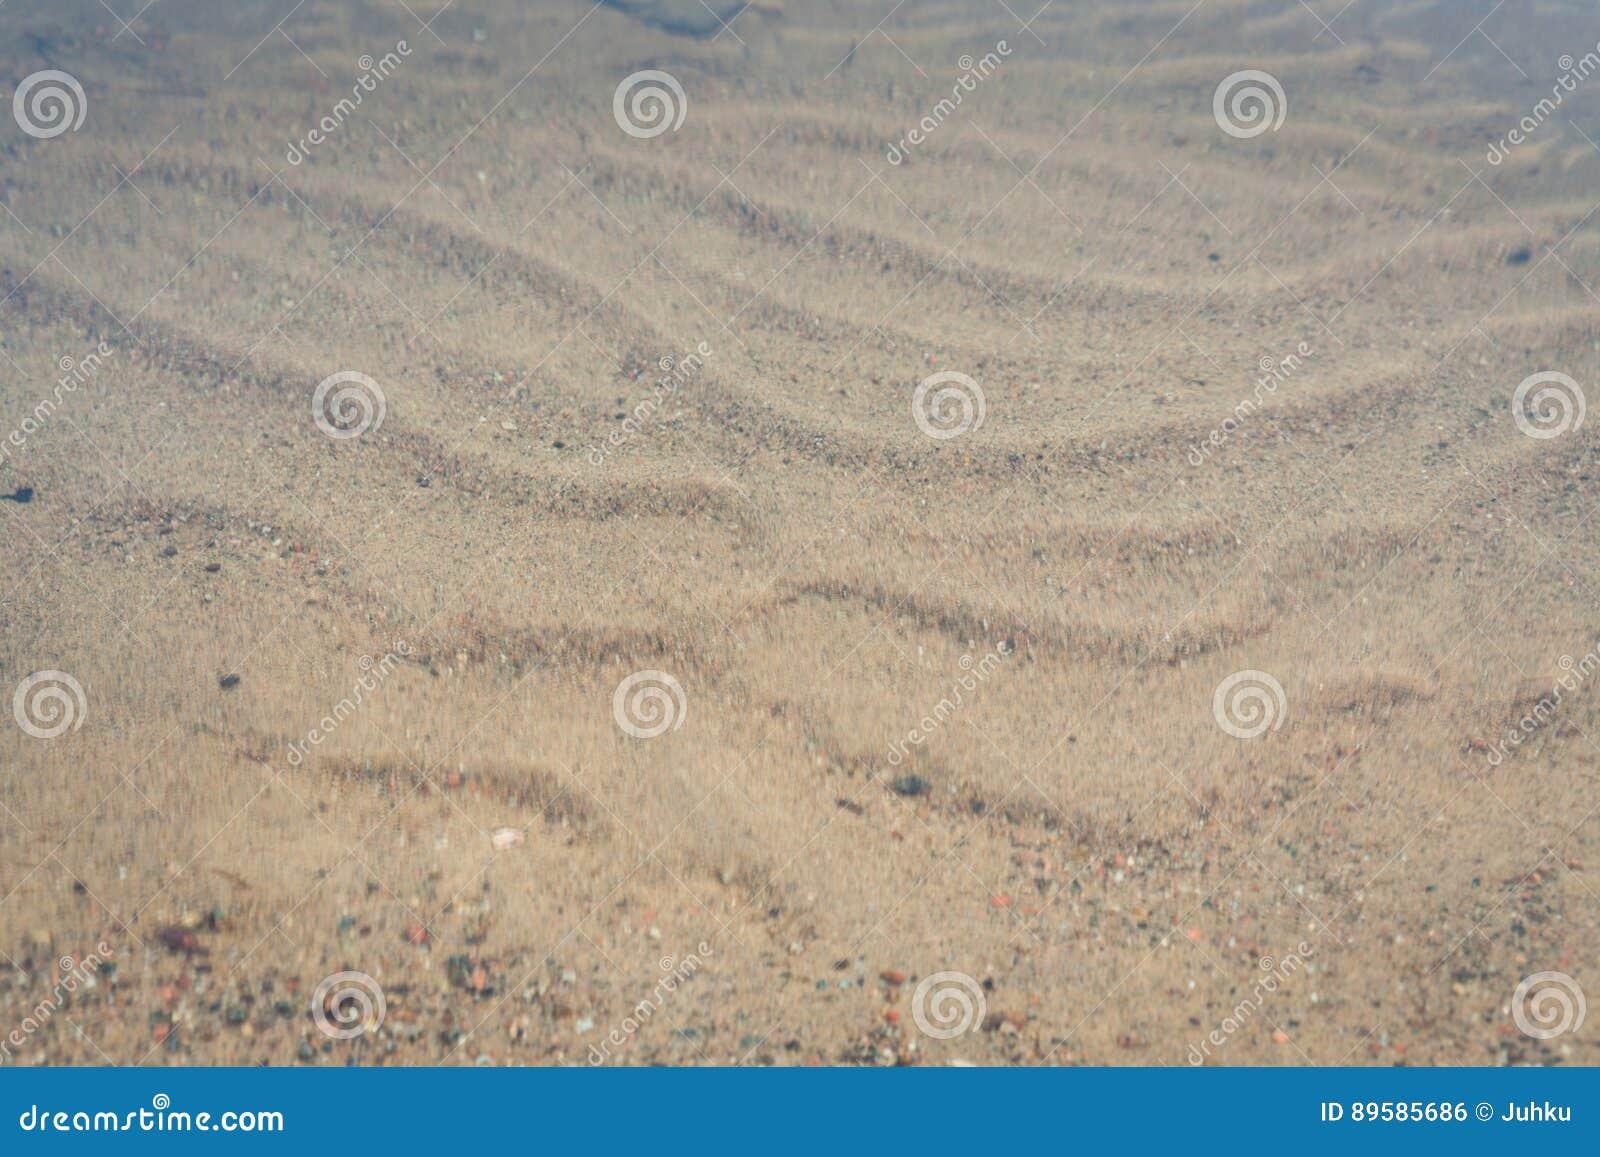 Zand door golven wordt gevormd die